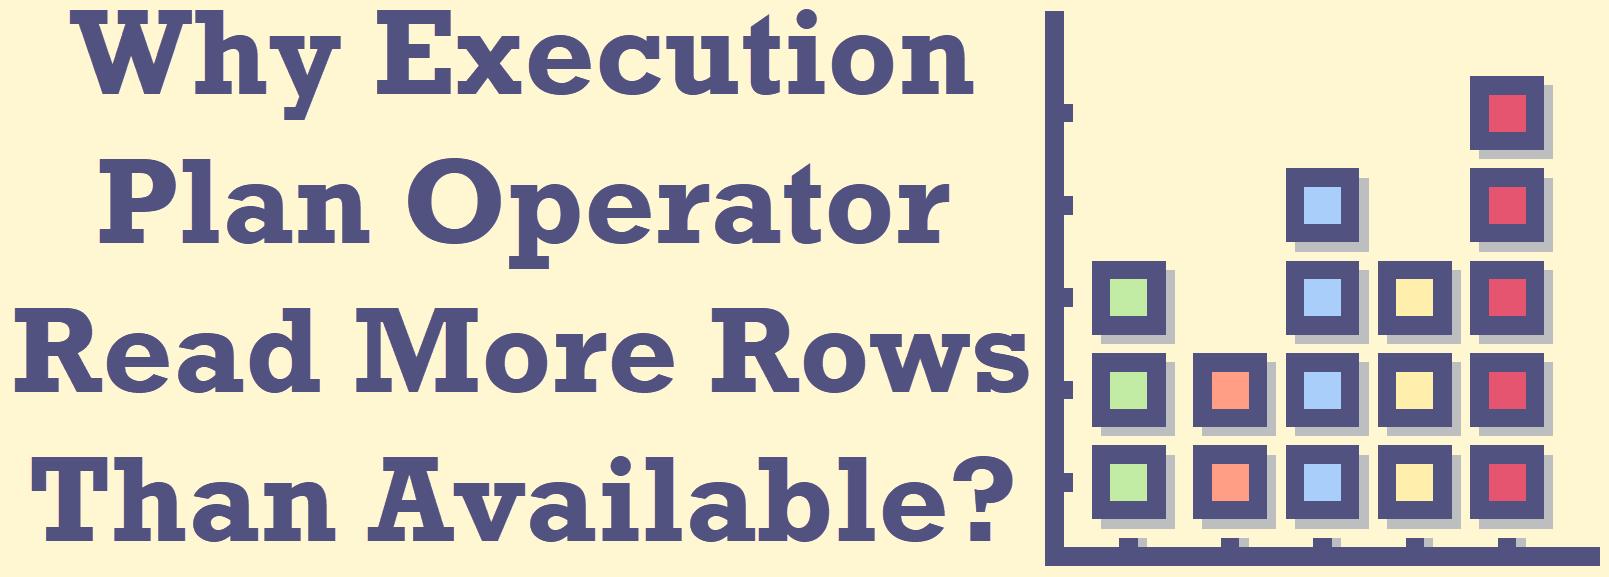 Execution Plan Operator